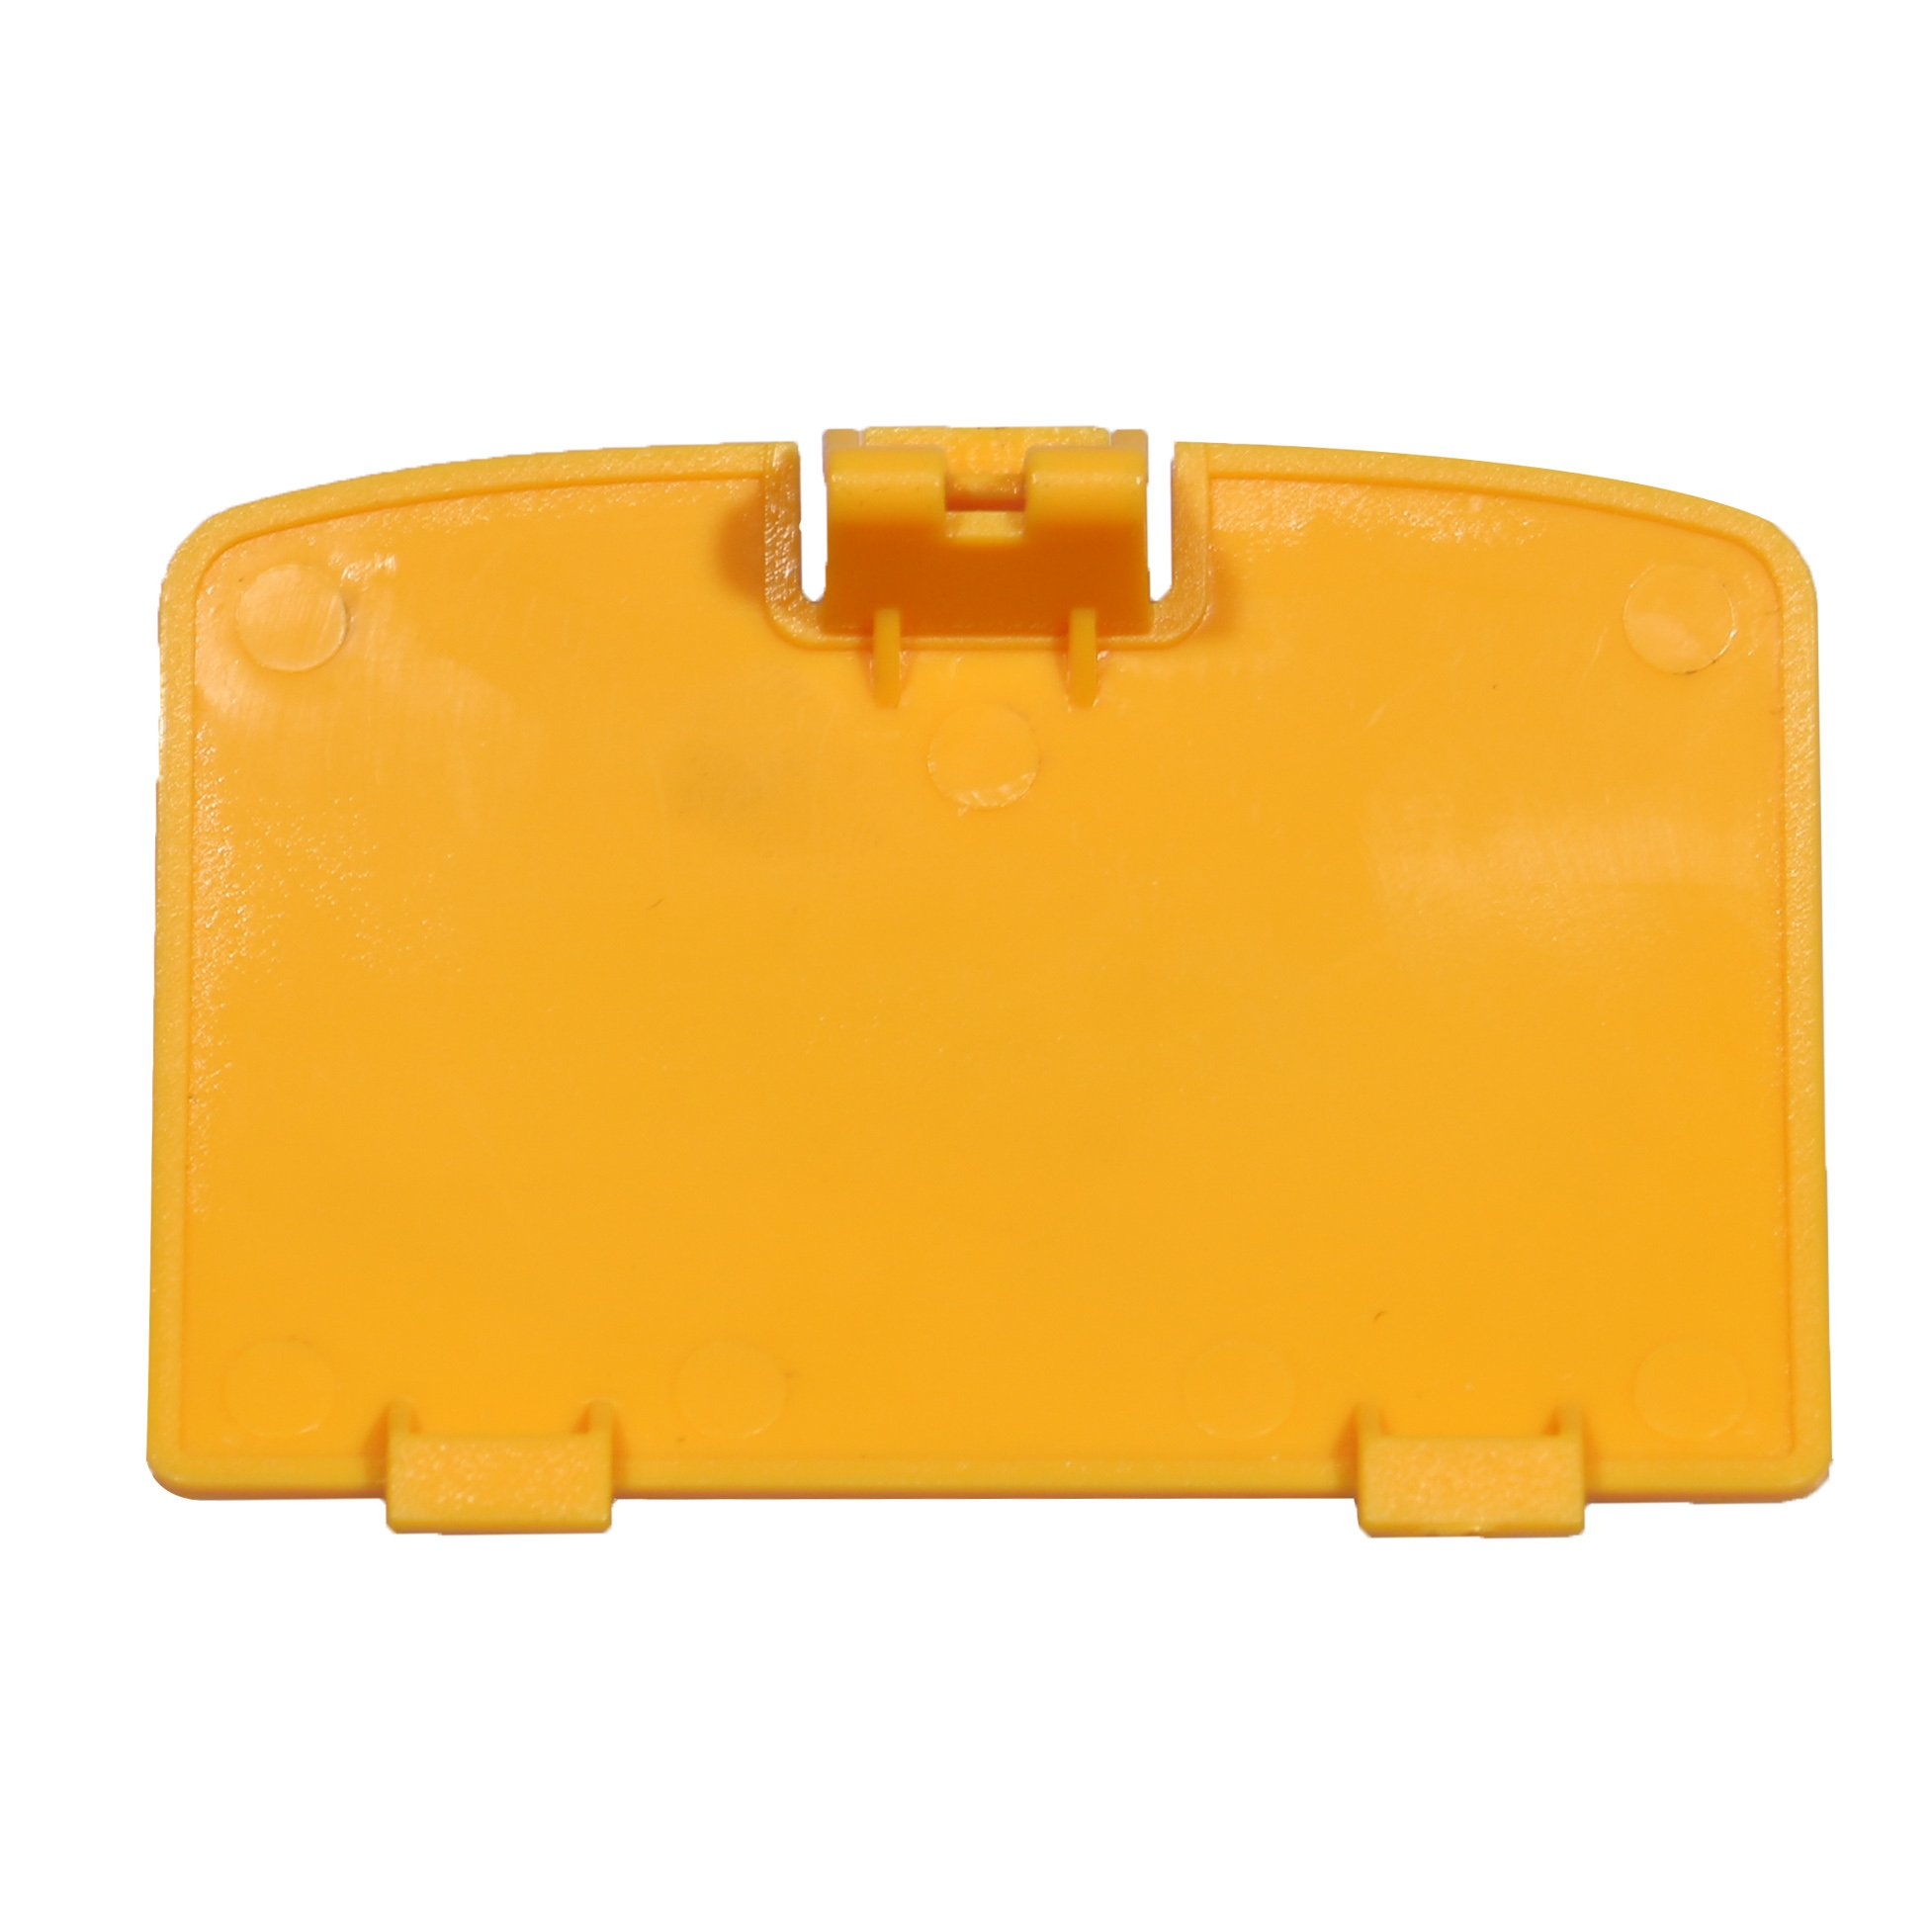 eJiasuゲーム機カラーバッテリーカバー交換1個 - オレンジ